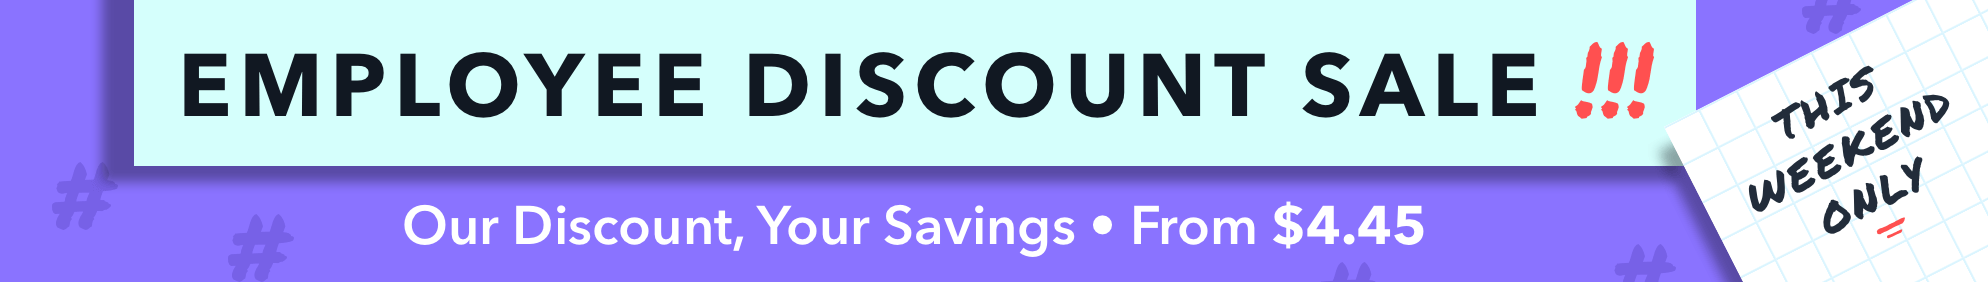 The Employee Discount Sale October 2019